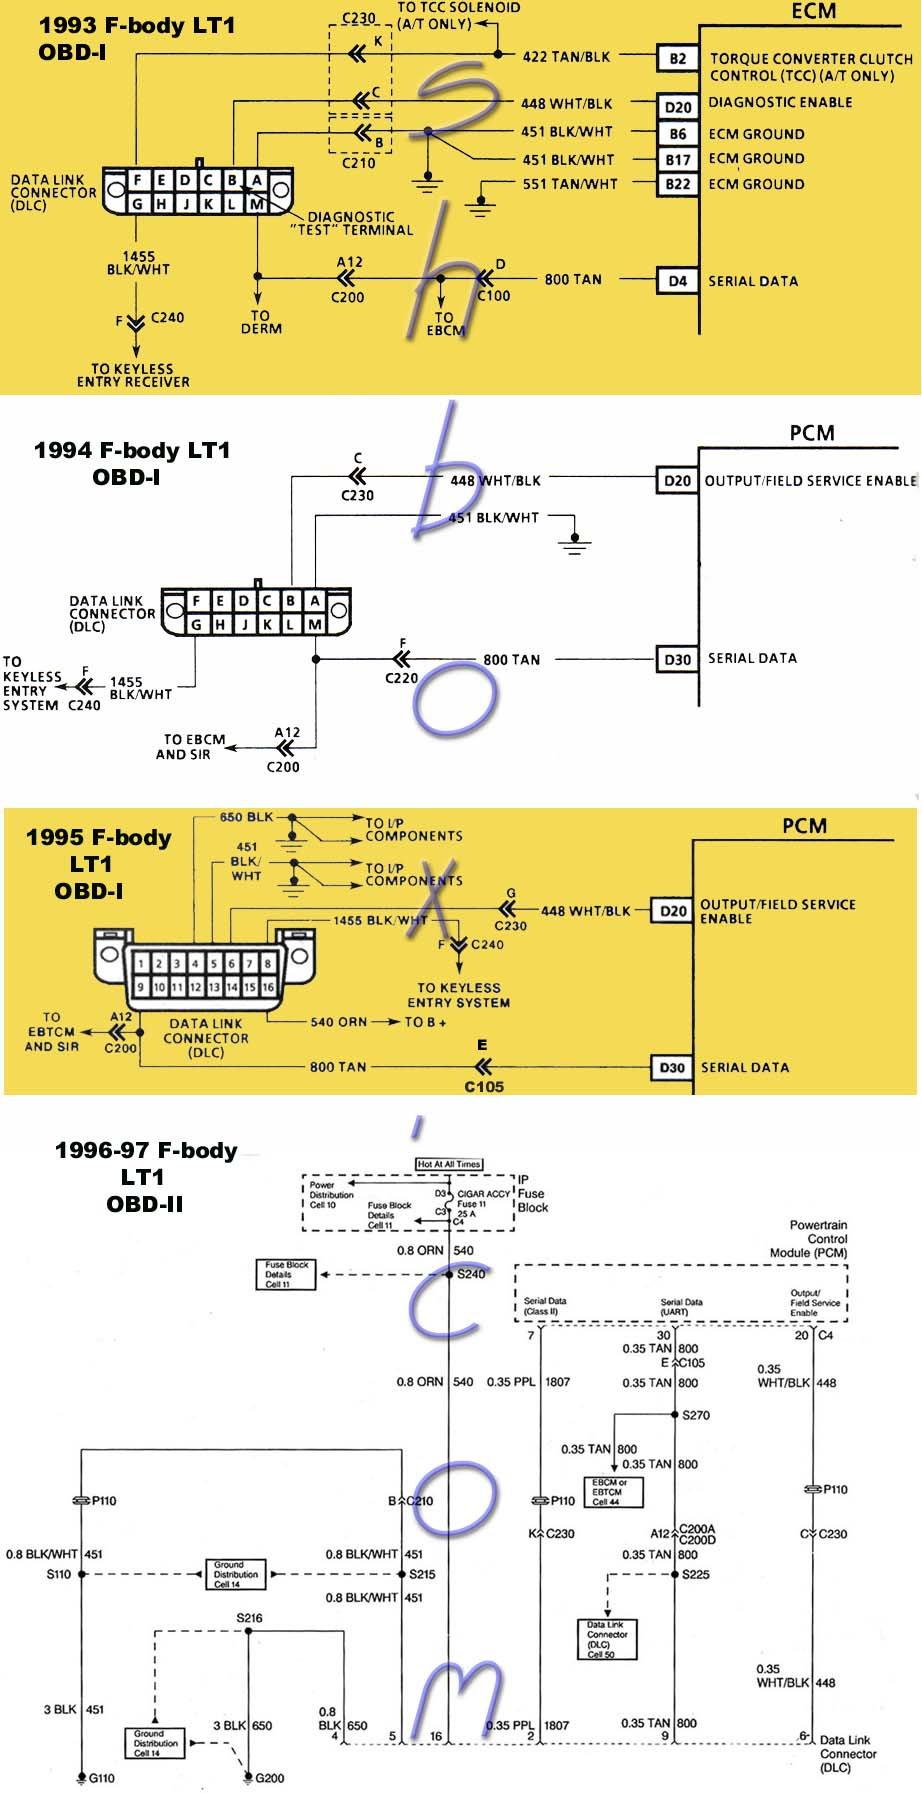 Wiringdiagram12vtrailerwiringdiagram12vtrailerplugwiring